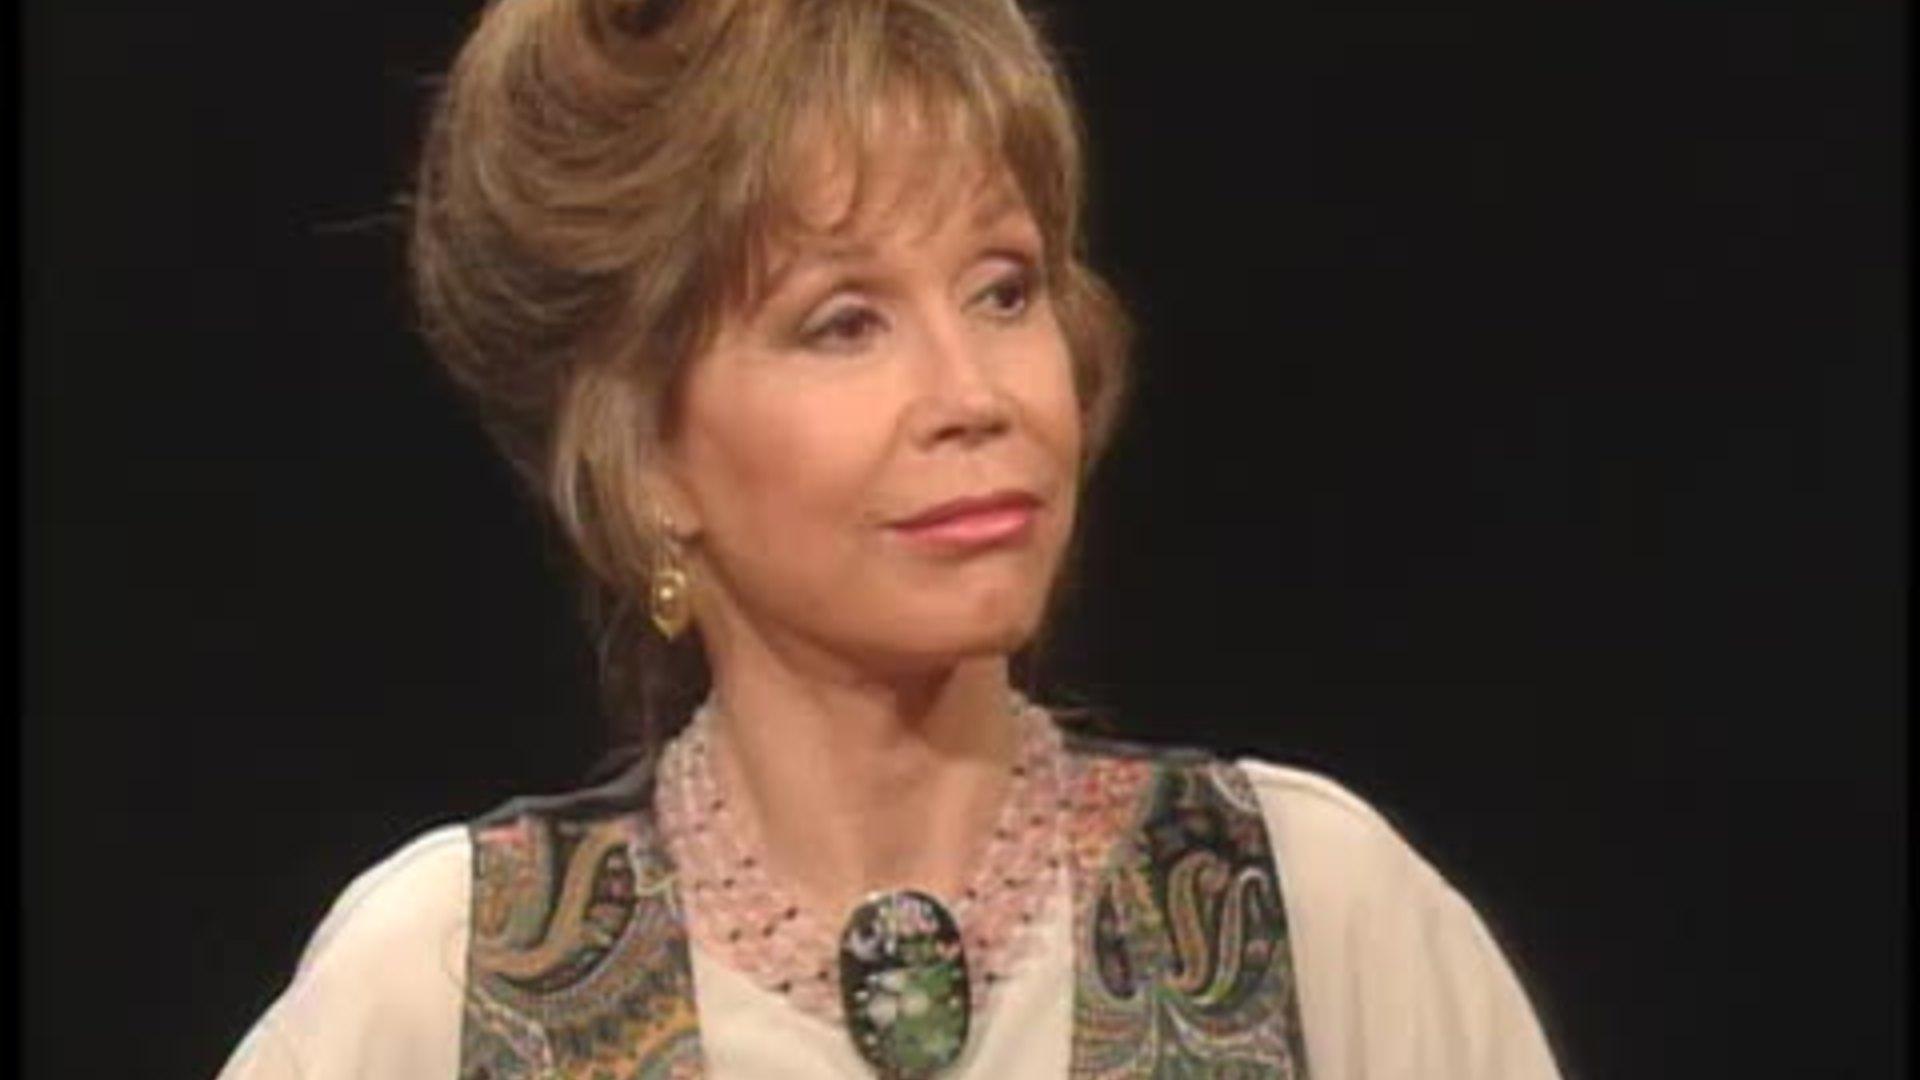 Helga Krapf (b. 1988) recommendations